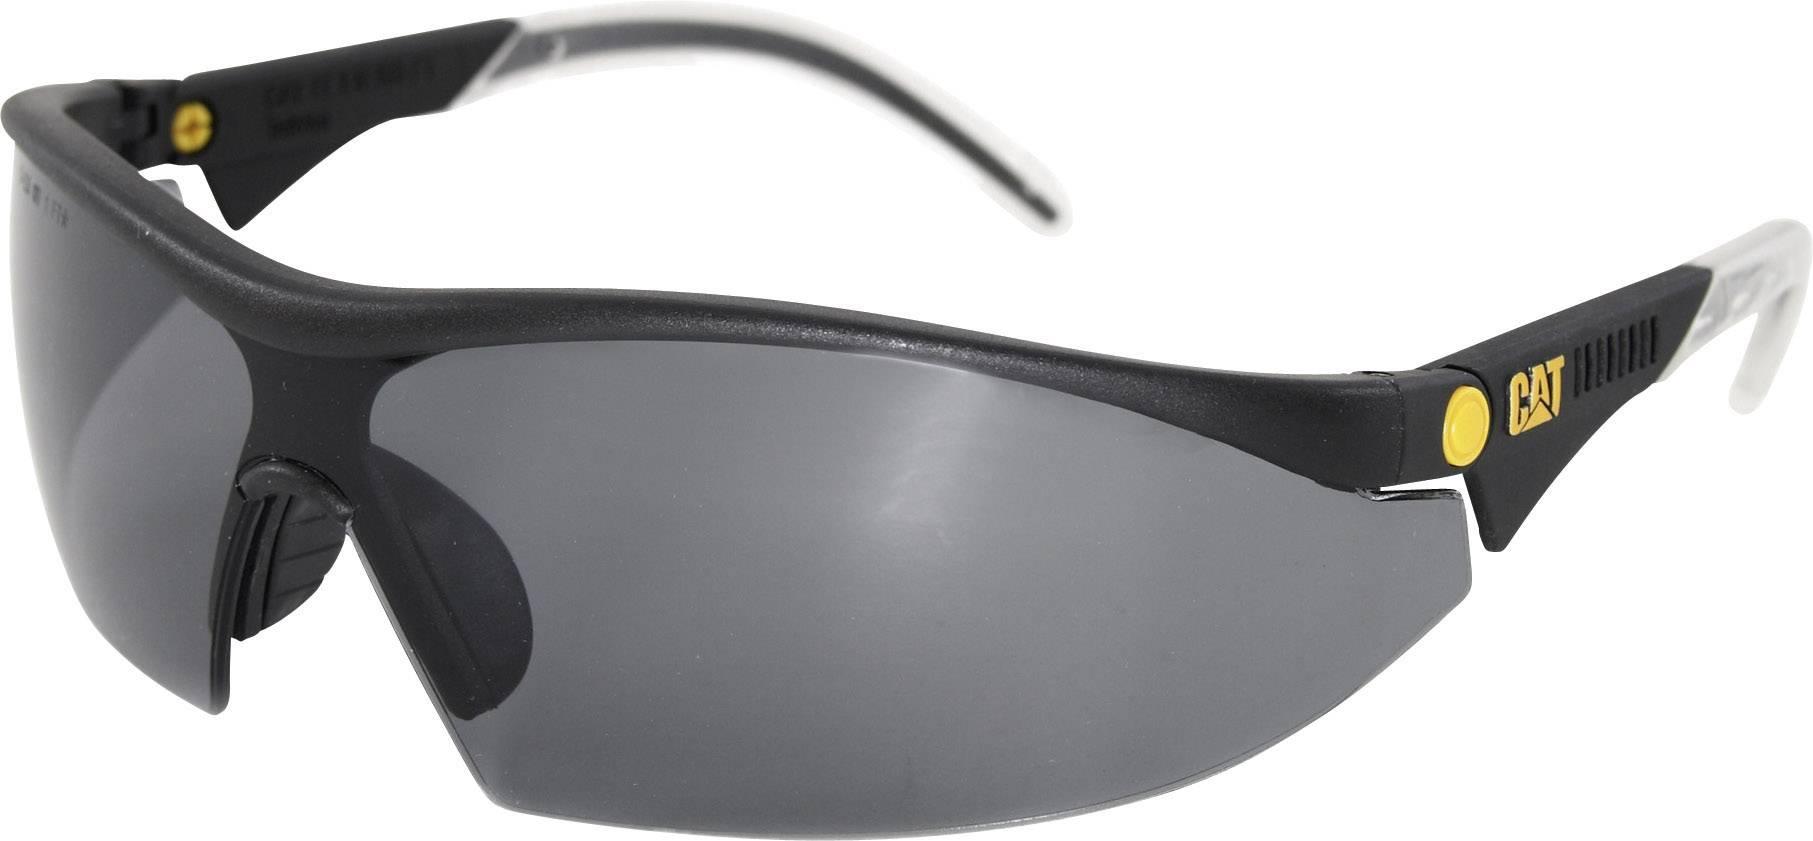 Ochranné okuliare CAT DIGGER104CATERPILLAR